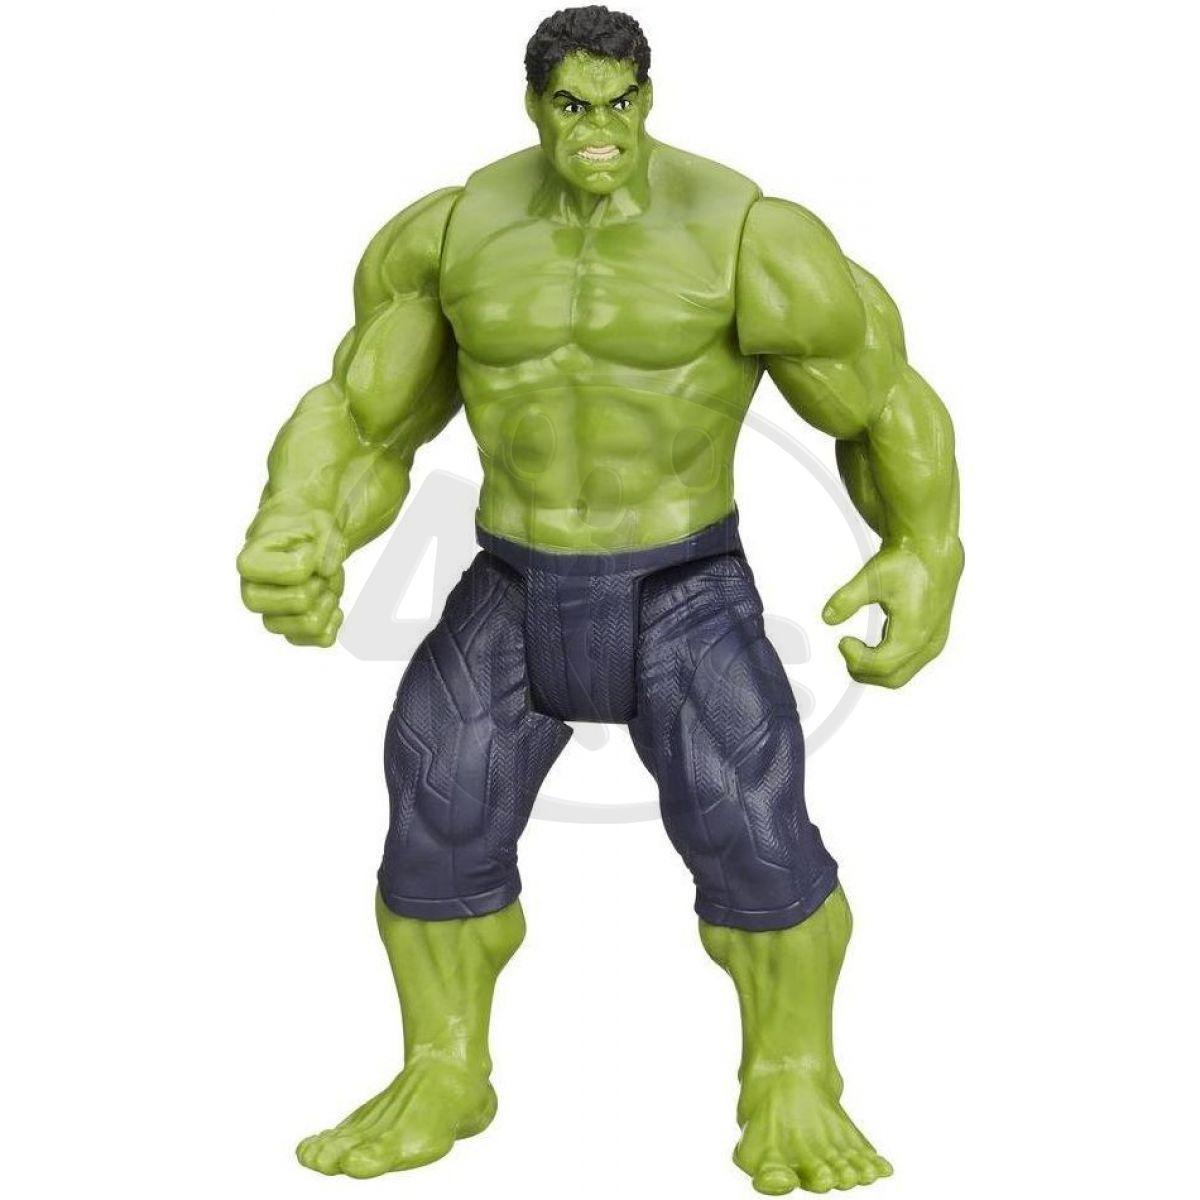 31329a086 Hasbro Marvel Avengers figurka 11 cm - Hulk | 4kids